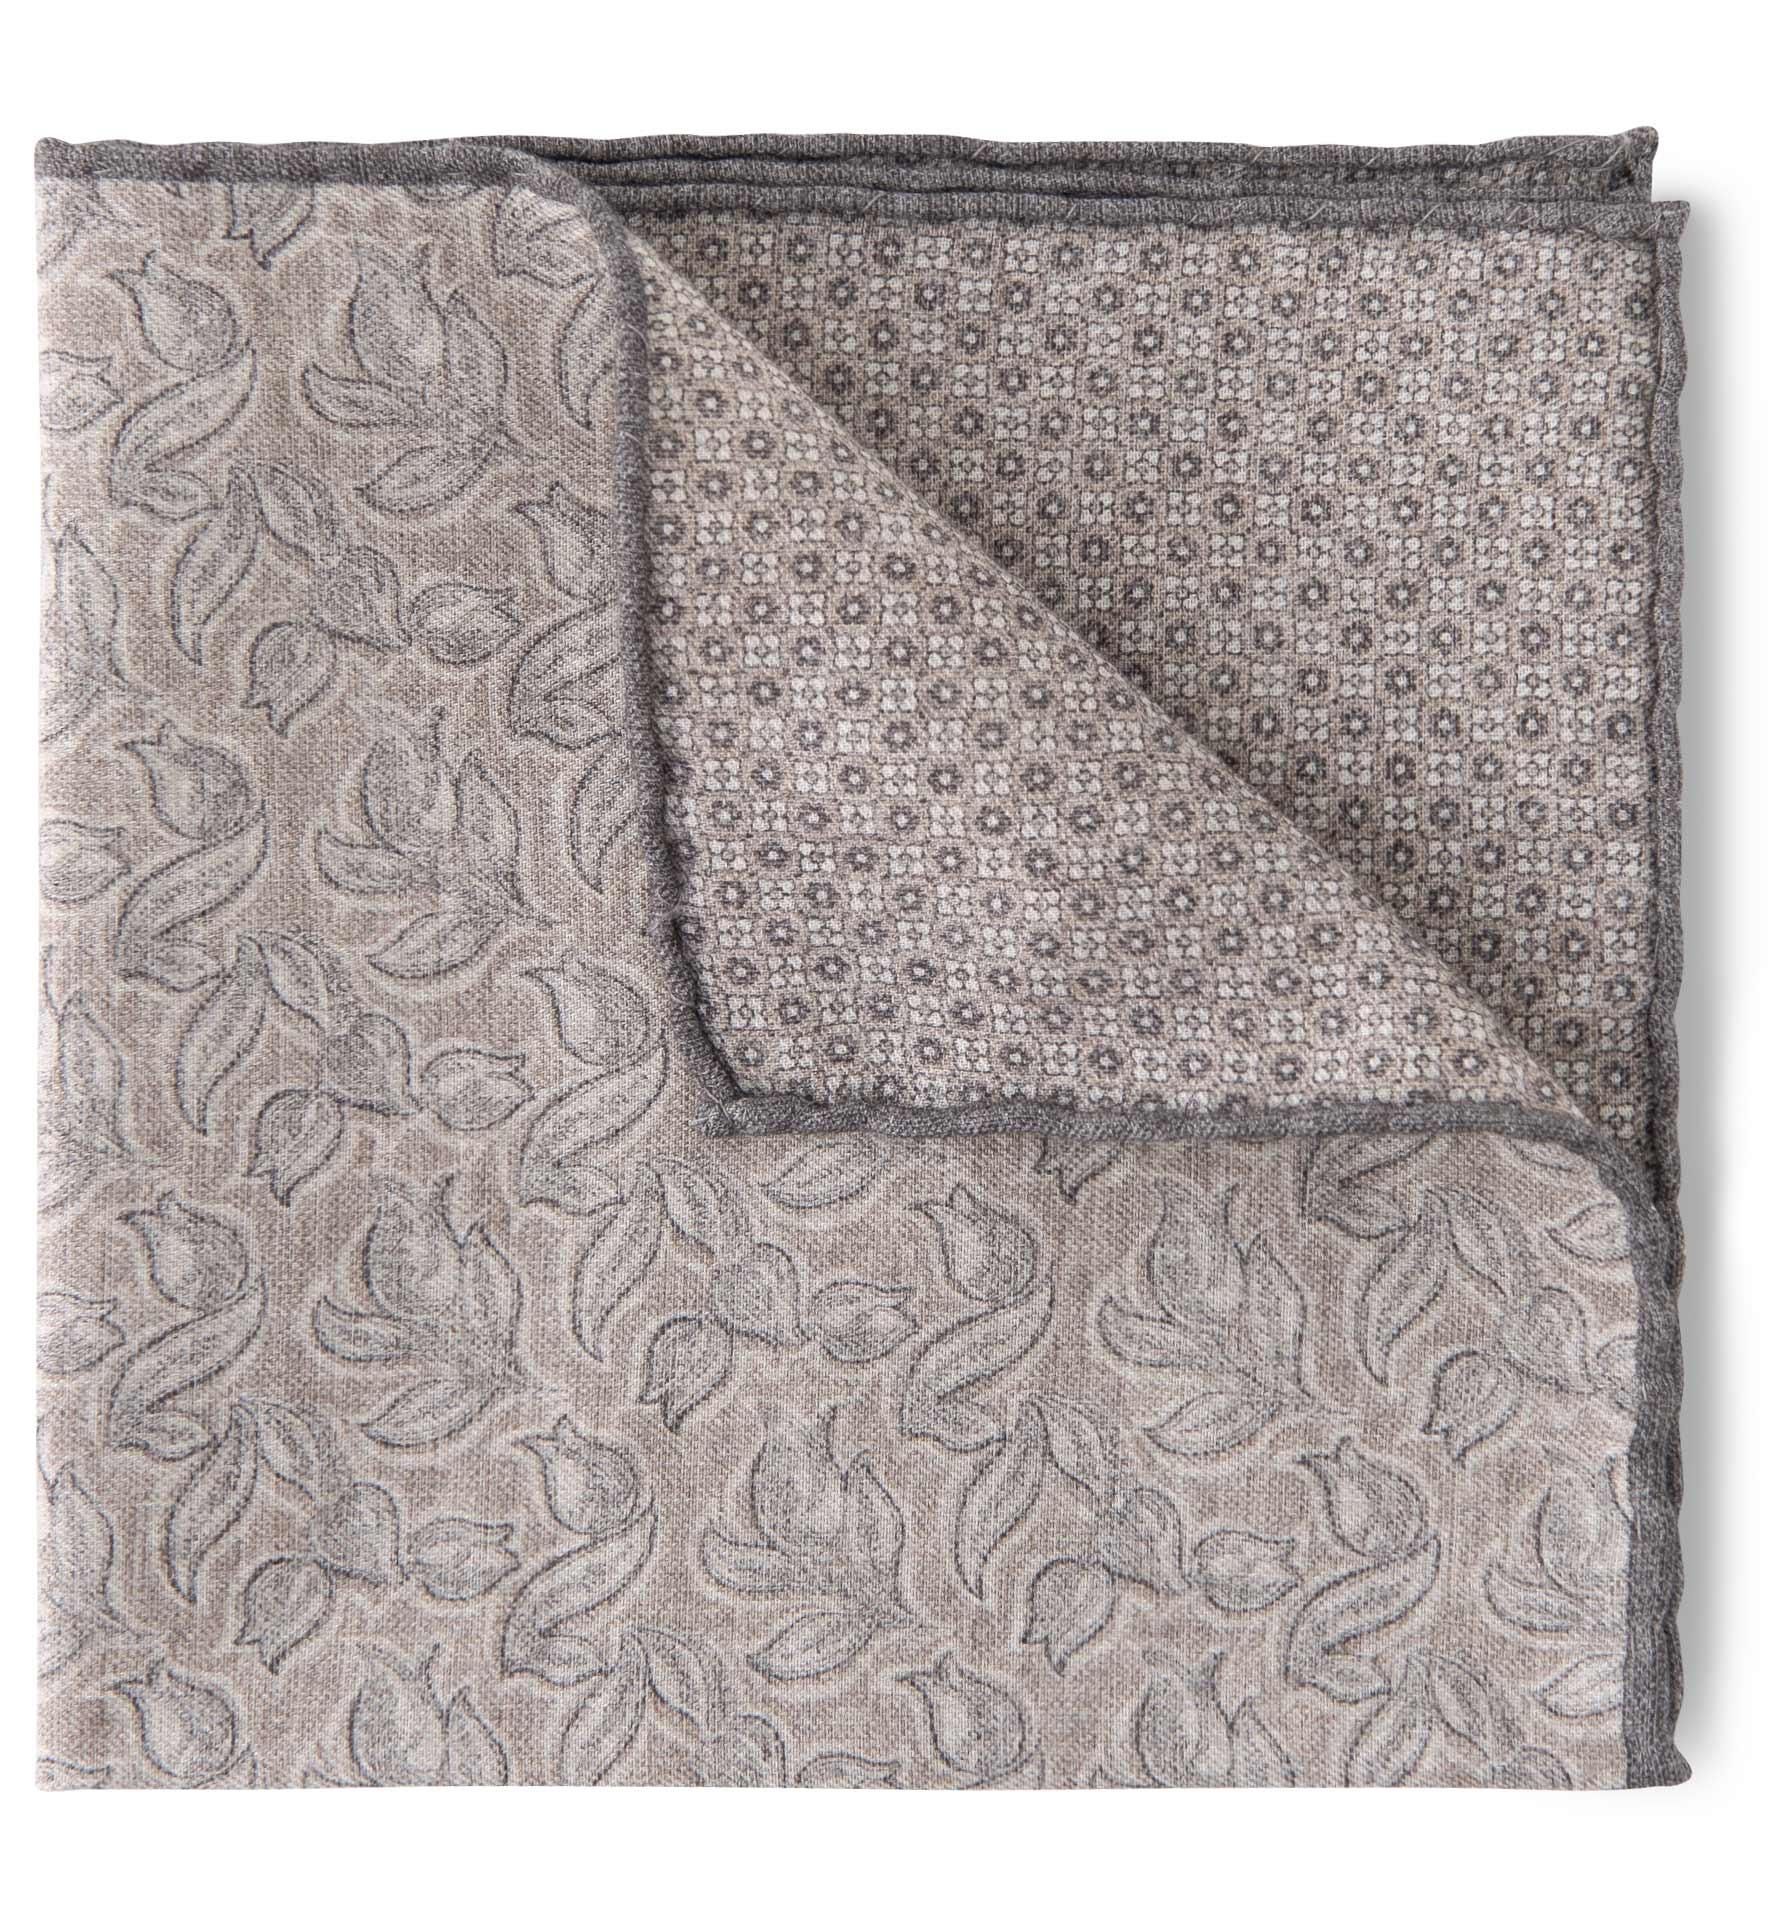 Zoom Image of Light Grey and Beige Floral Print Pocket Square